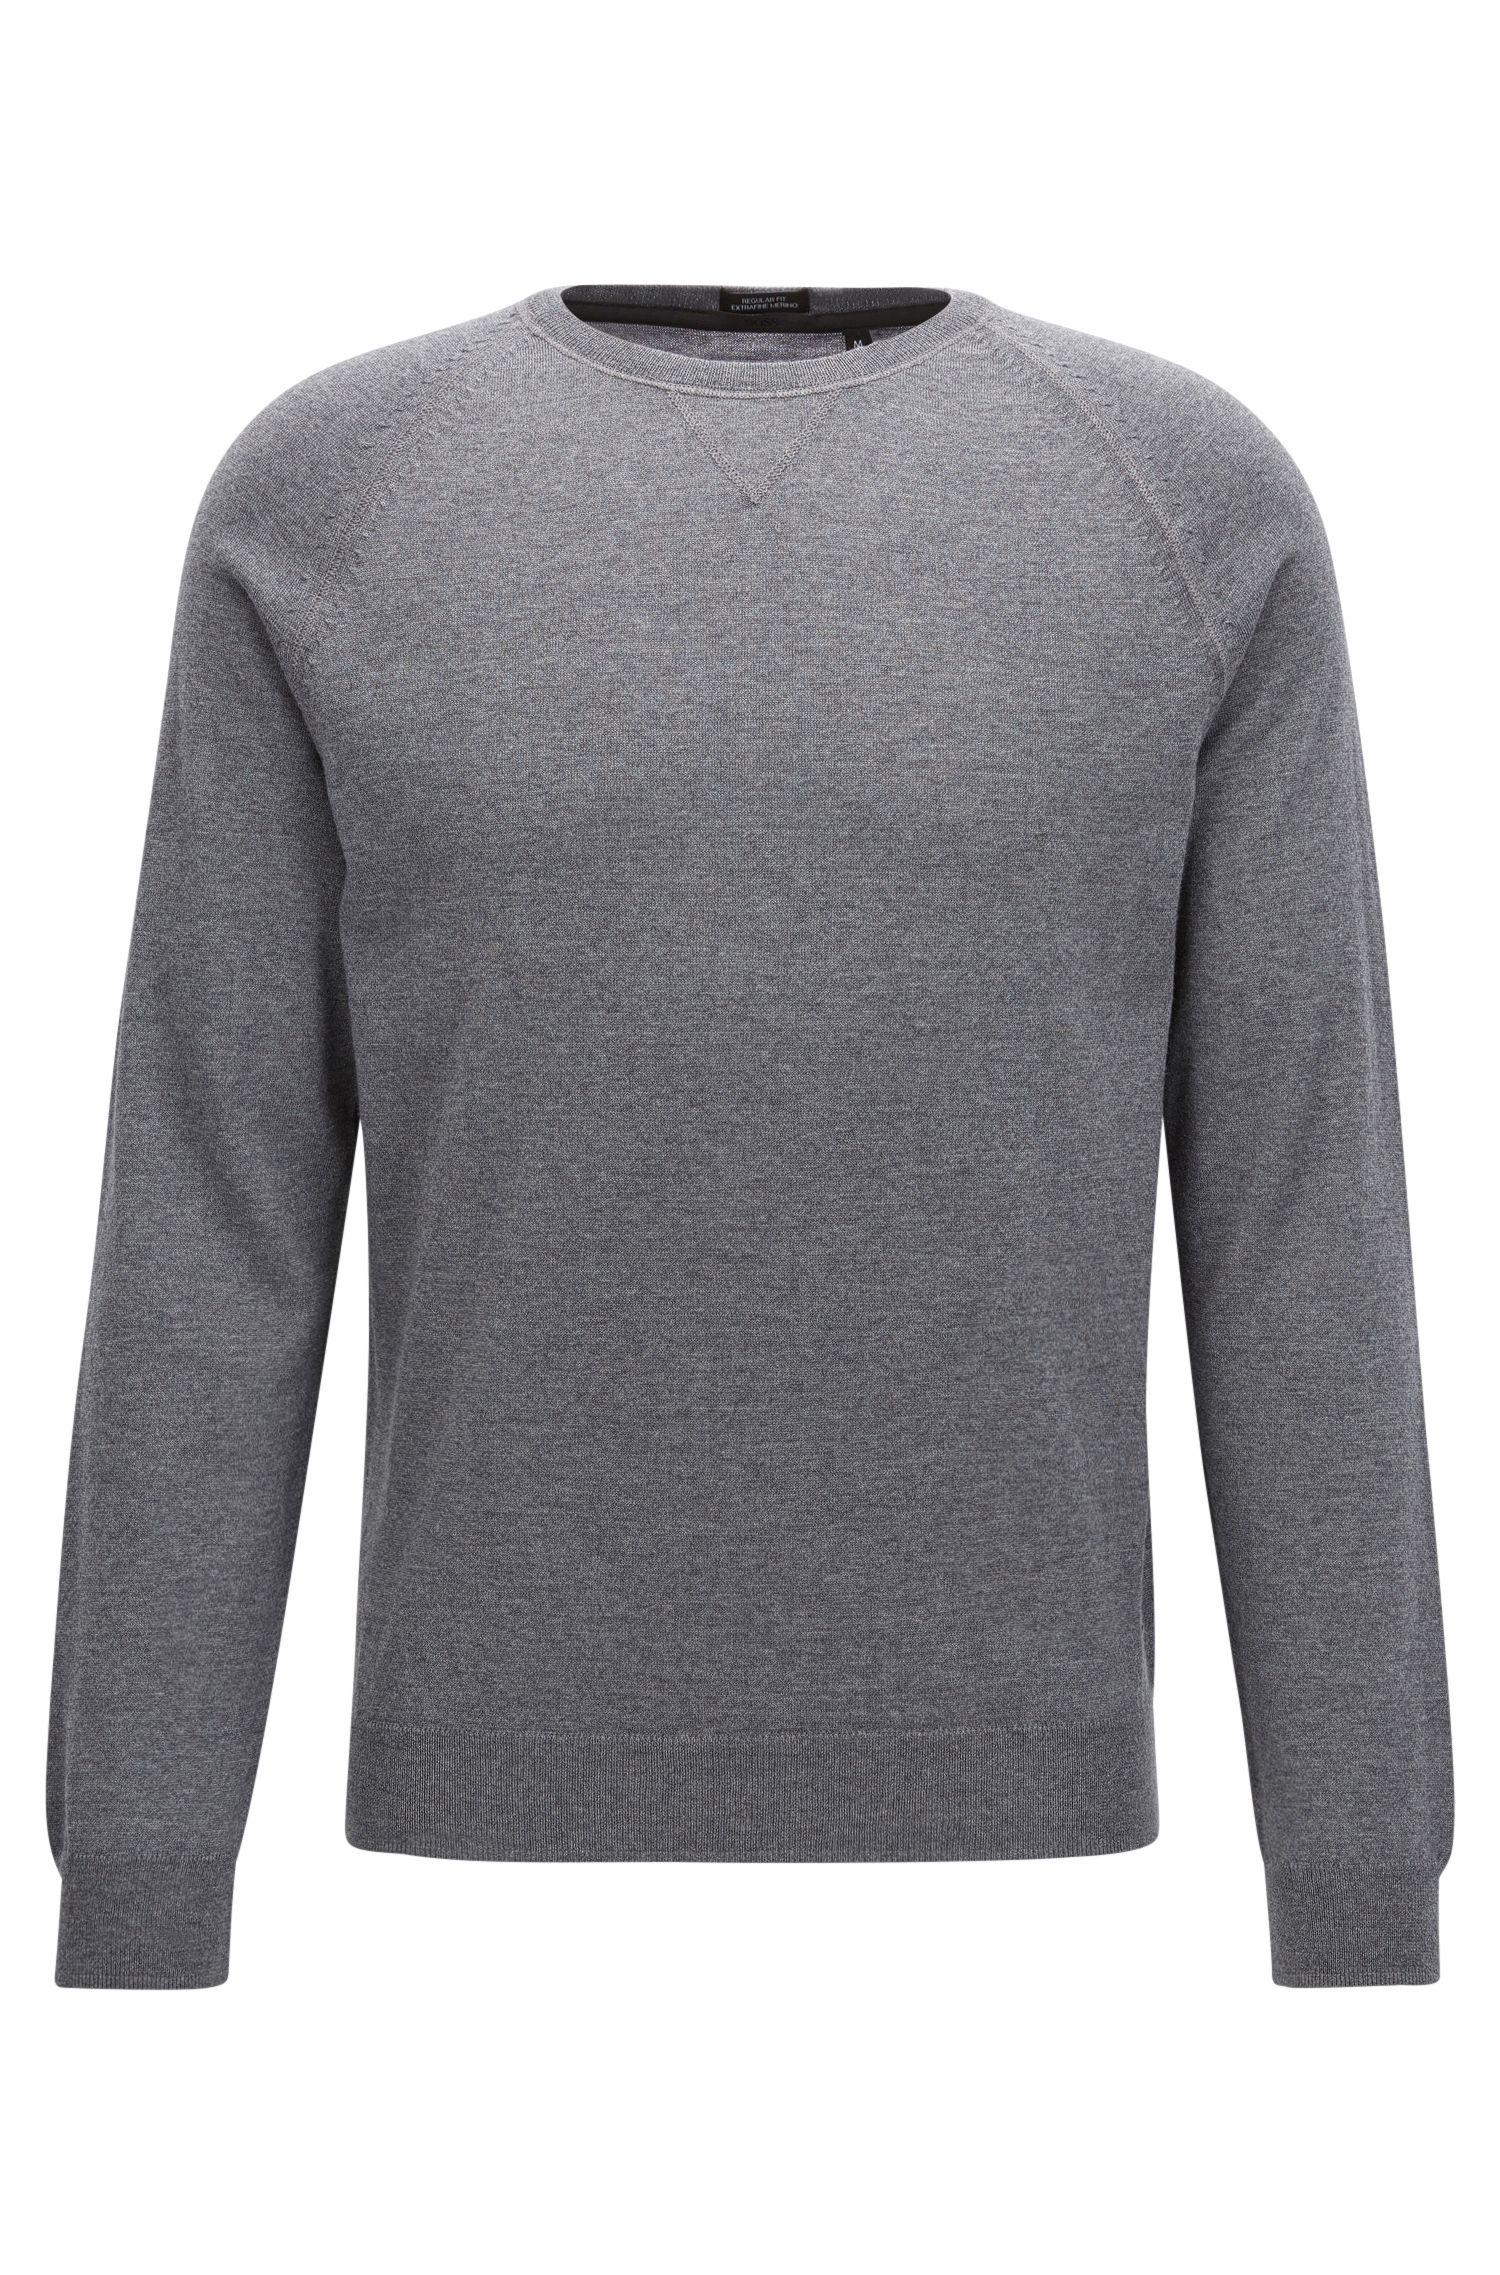 Crew-neck sweater in Merino wool